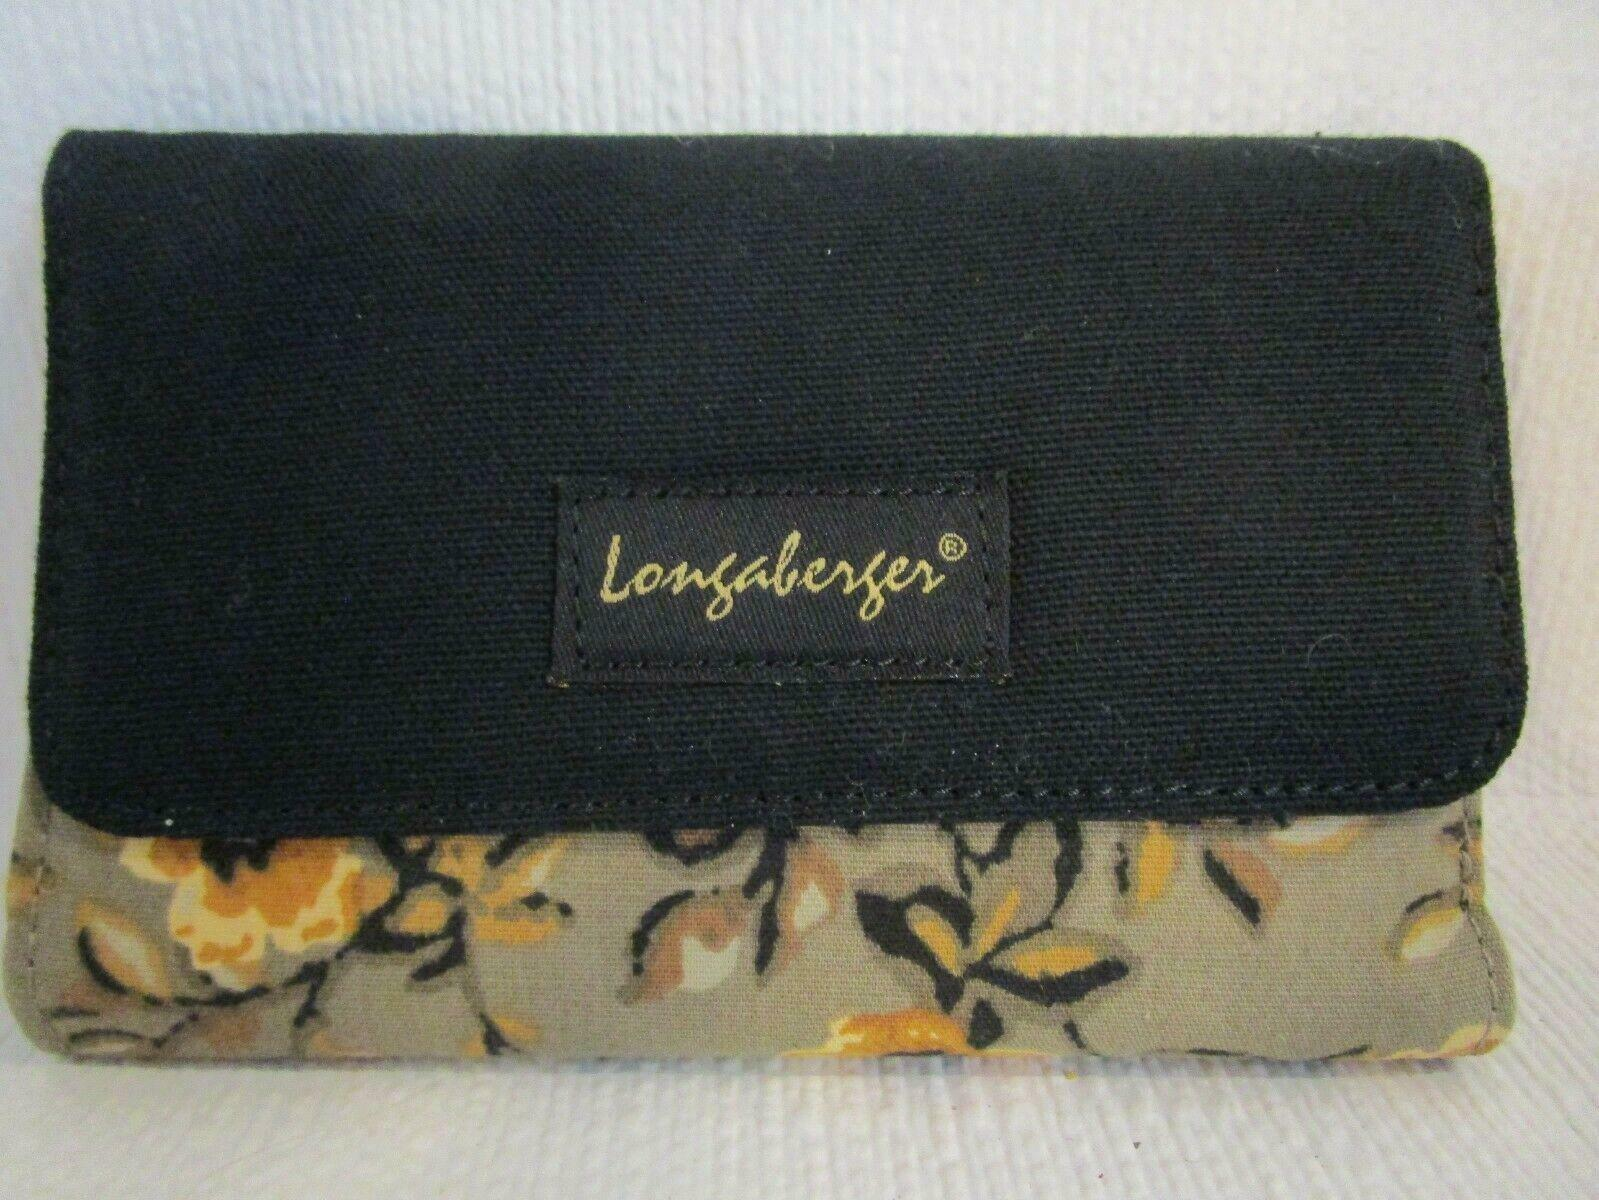 LONGABERGER Ladies' Tri-Fold Wallet Zippered Coin Purse